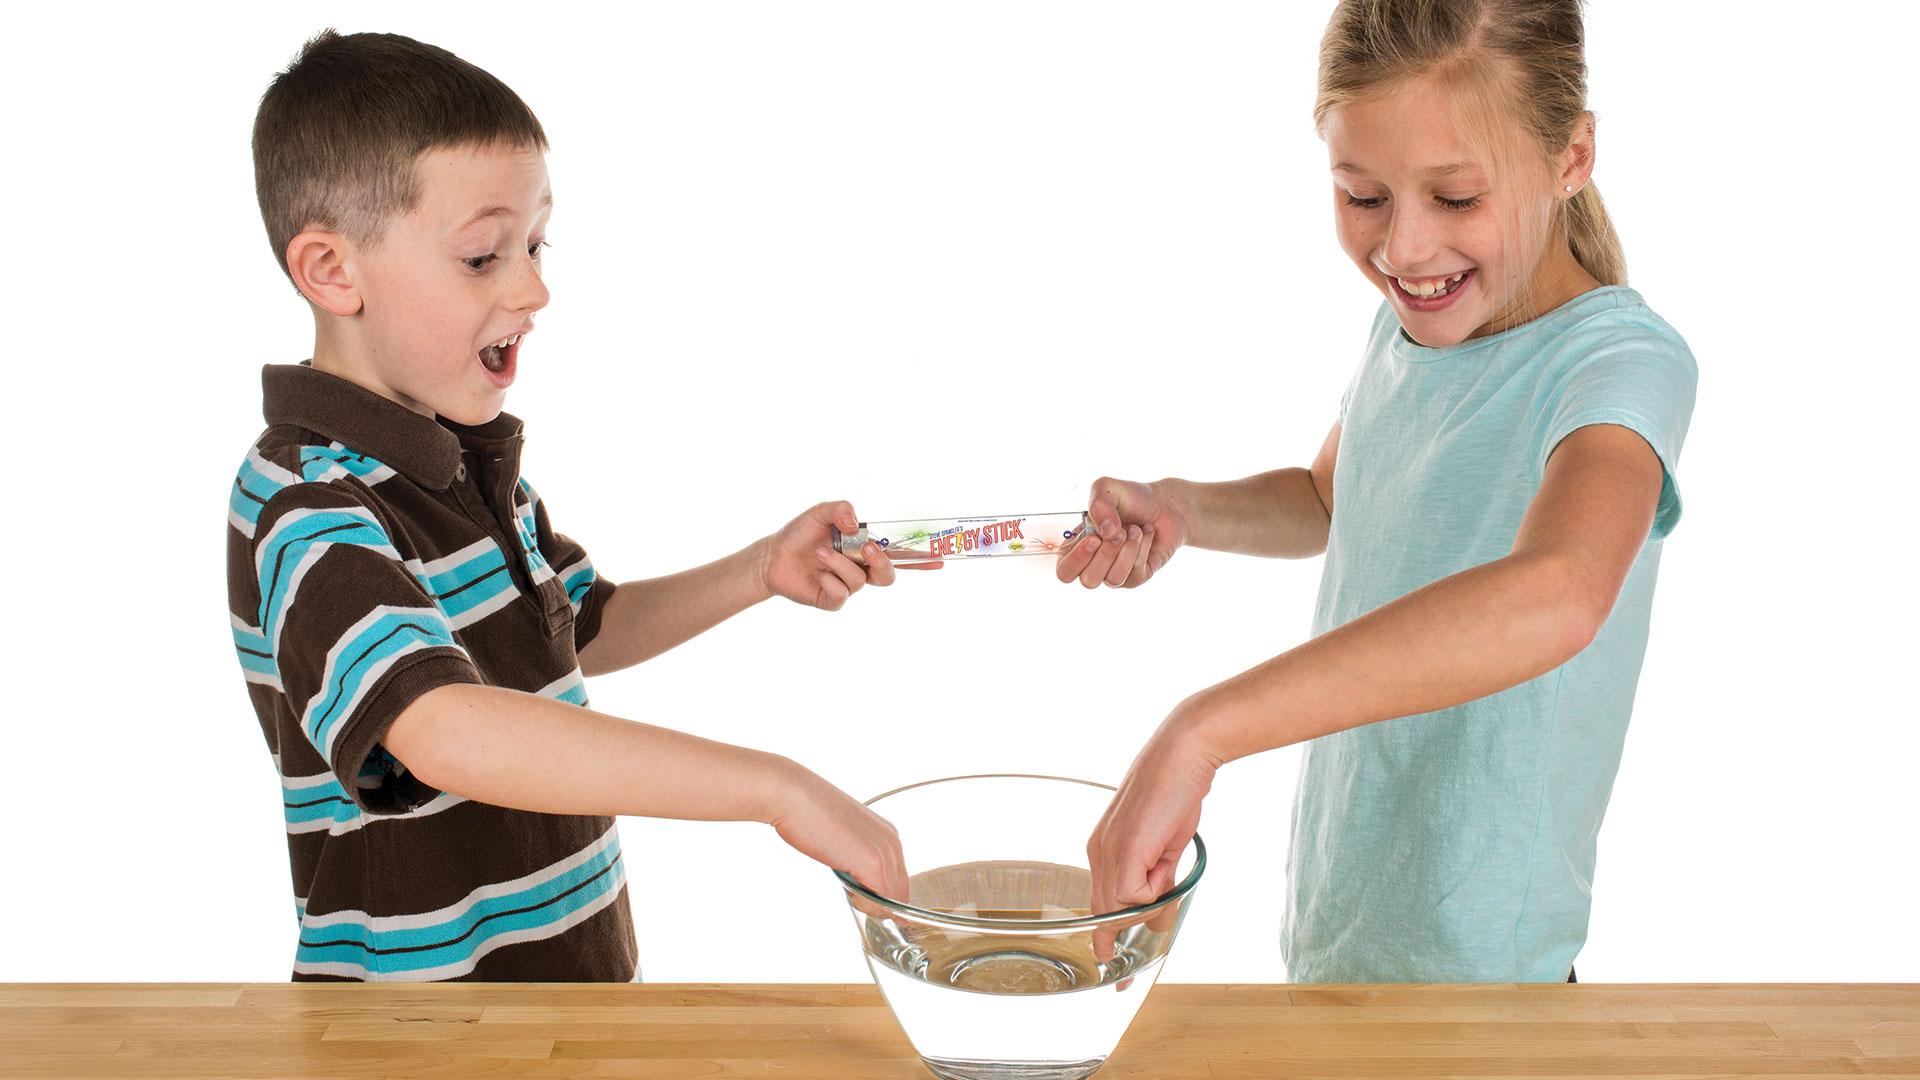 Energy Stick Sensor Stick Kids Toys Human Conductivity Energy Stick Sci-Fi Tube